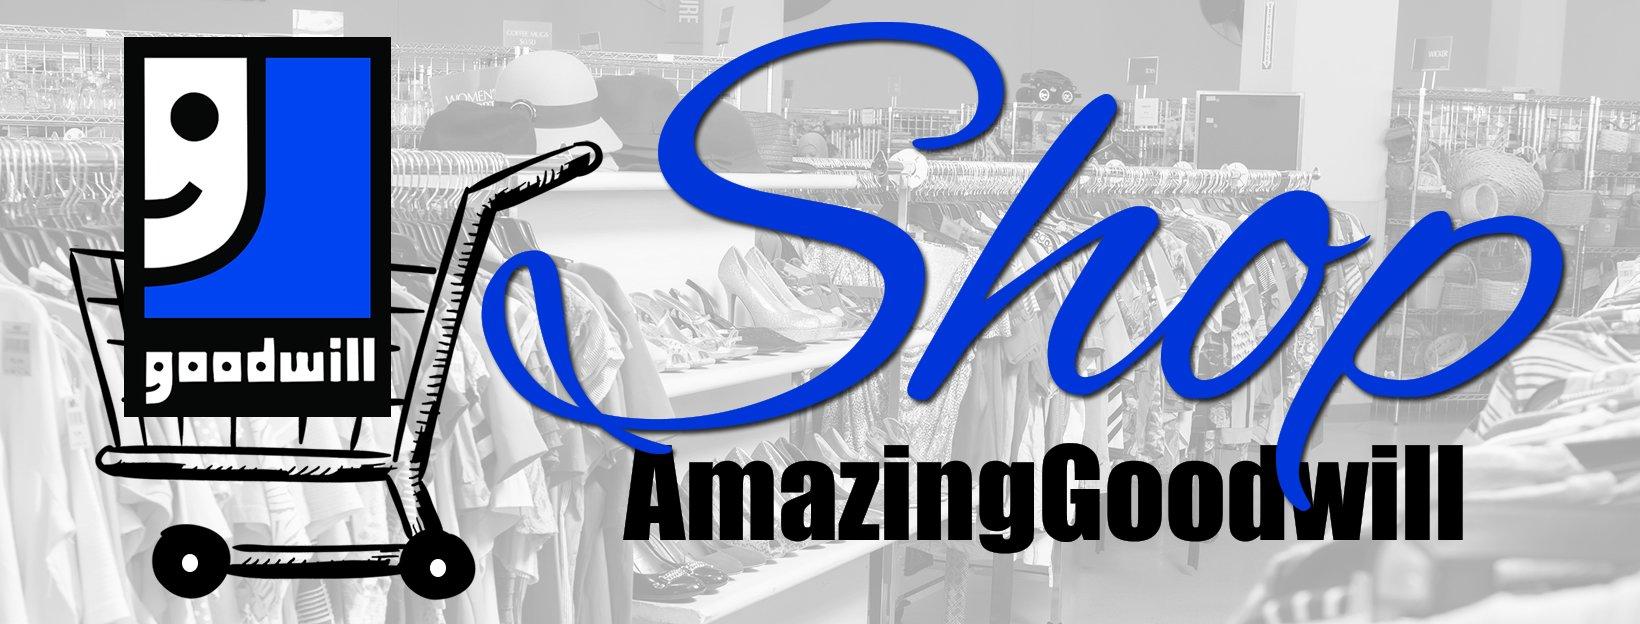 Shop AmazingGoodwill